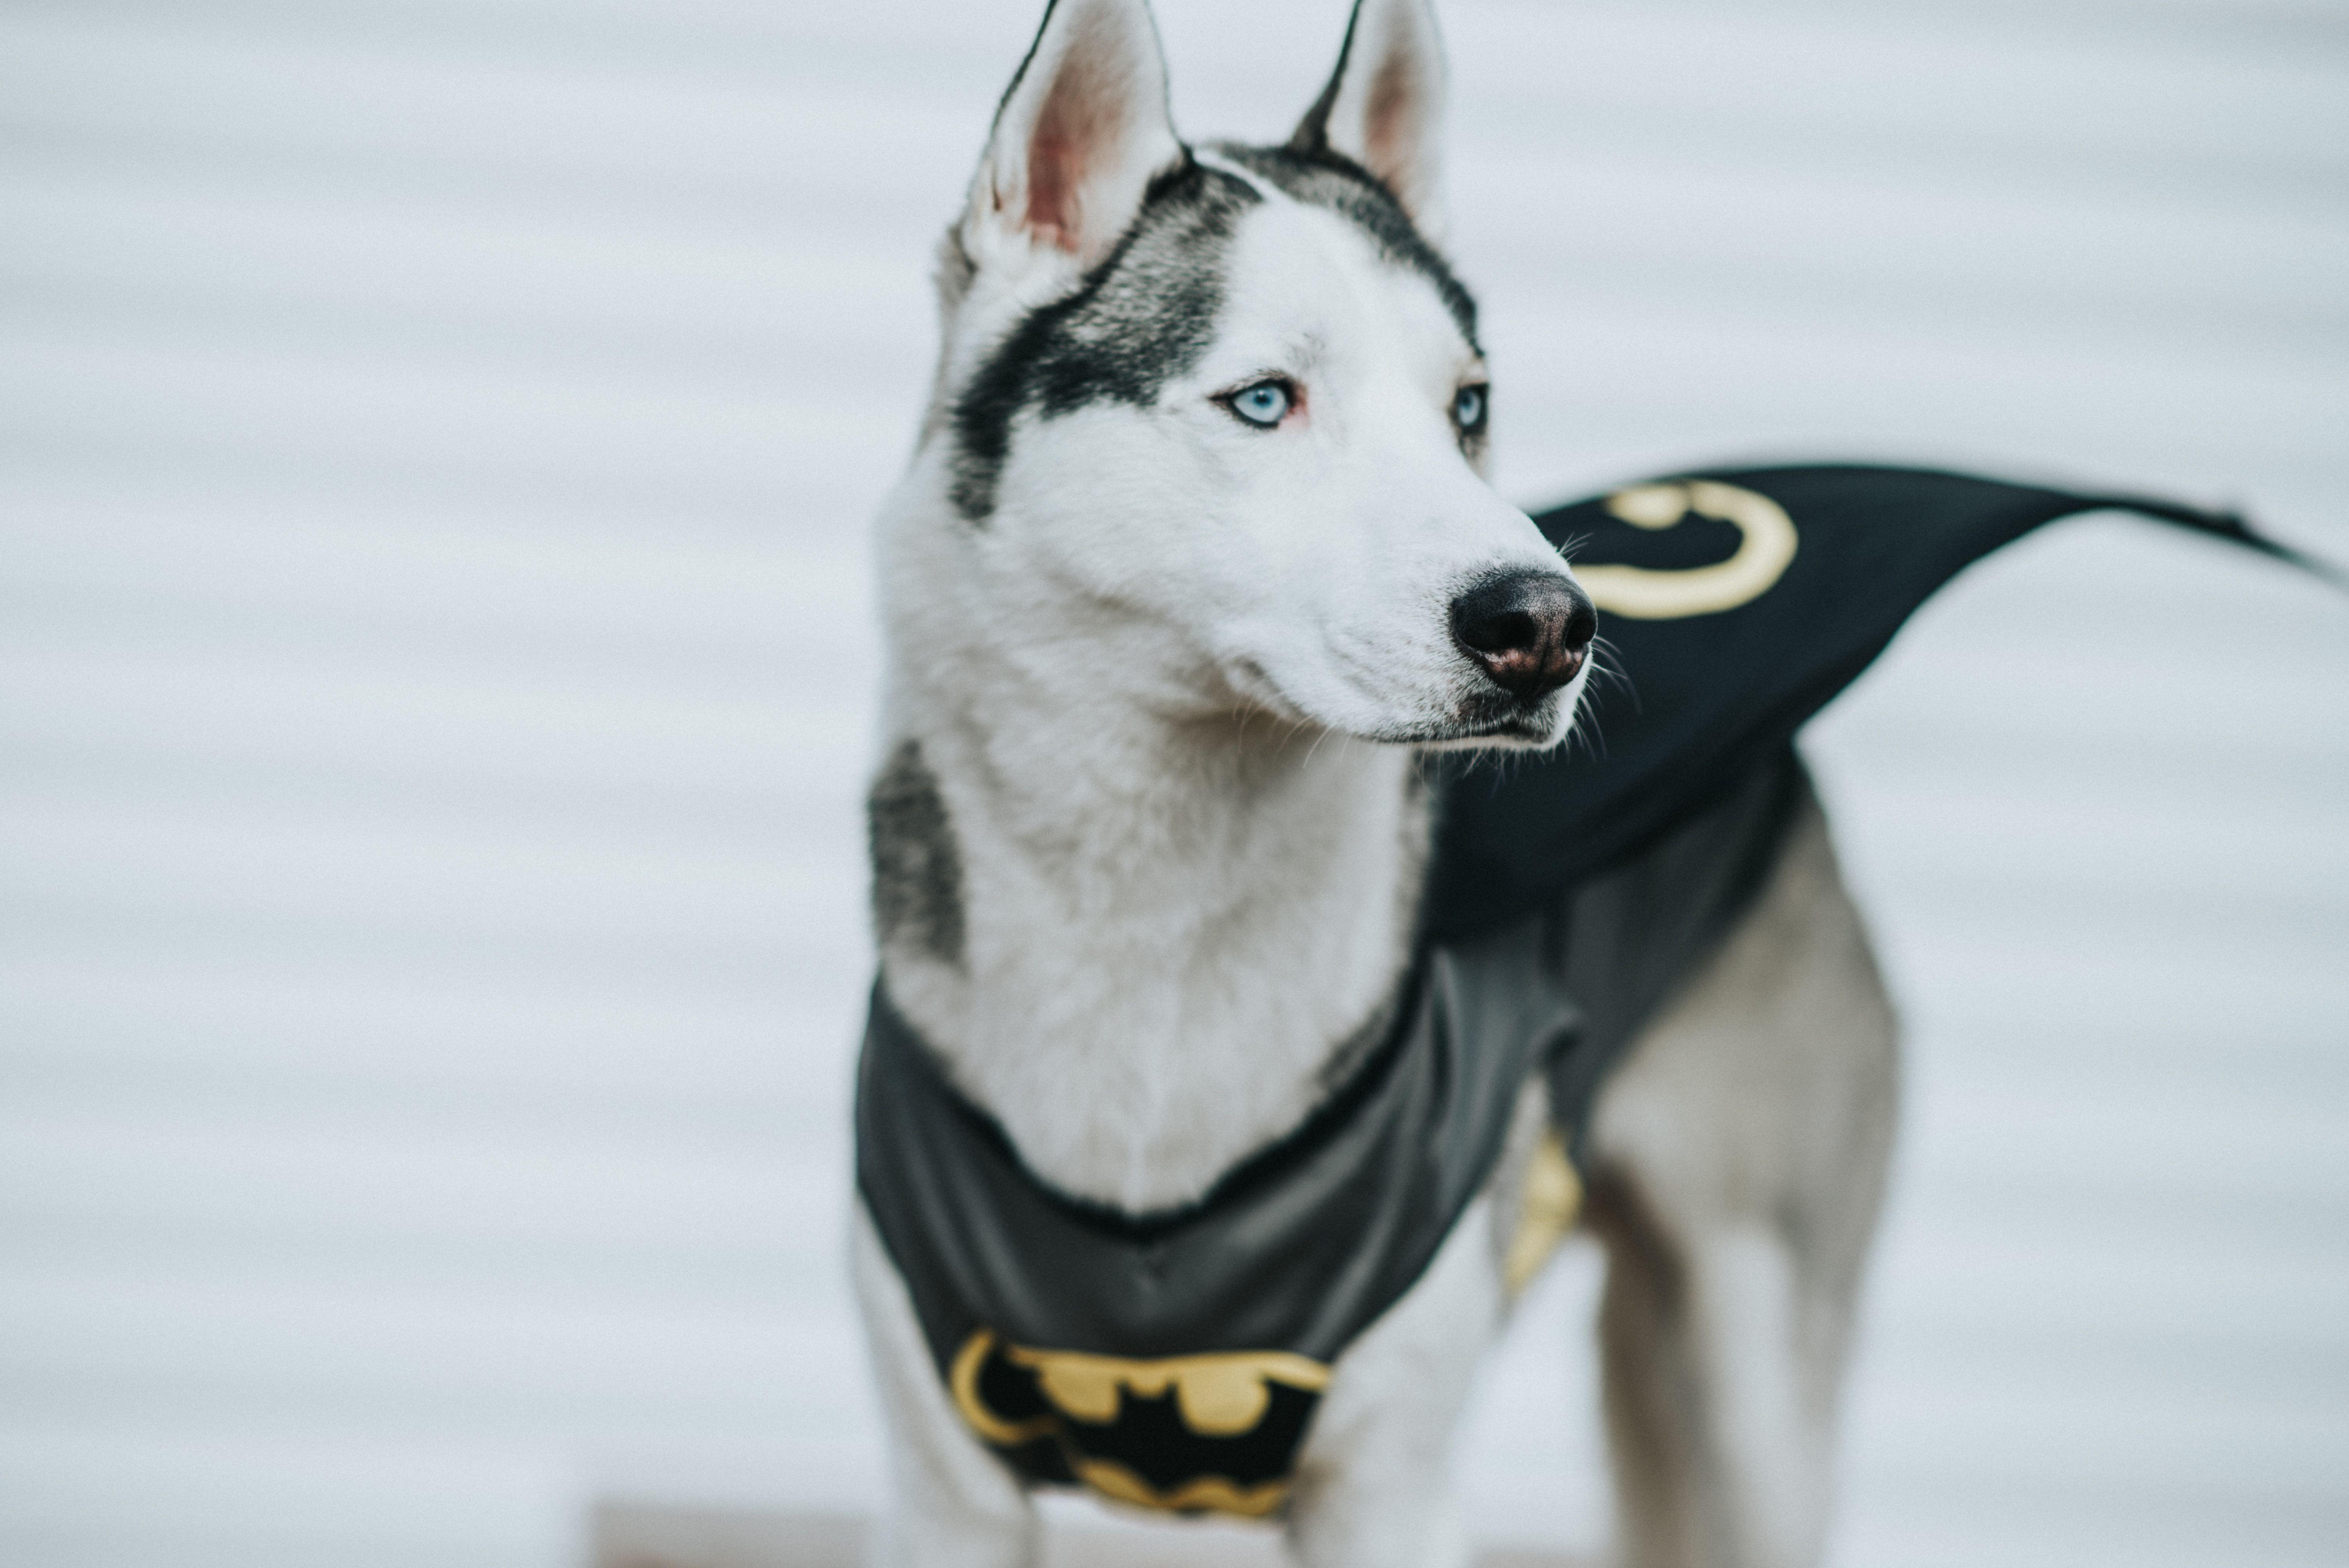 Batman Husky Halloween Costume Peteethehusky Pet Halloween